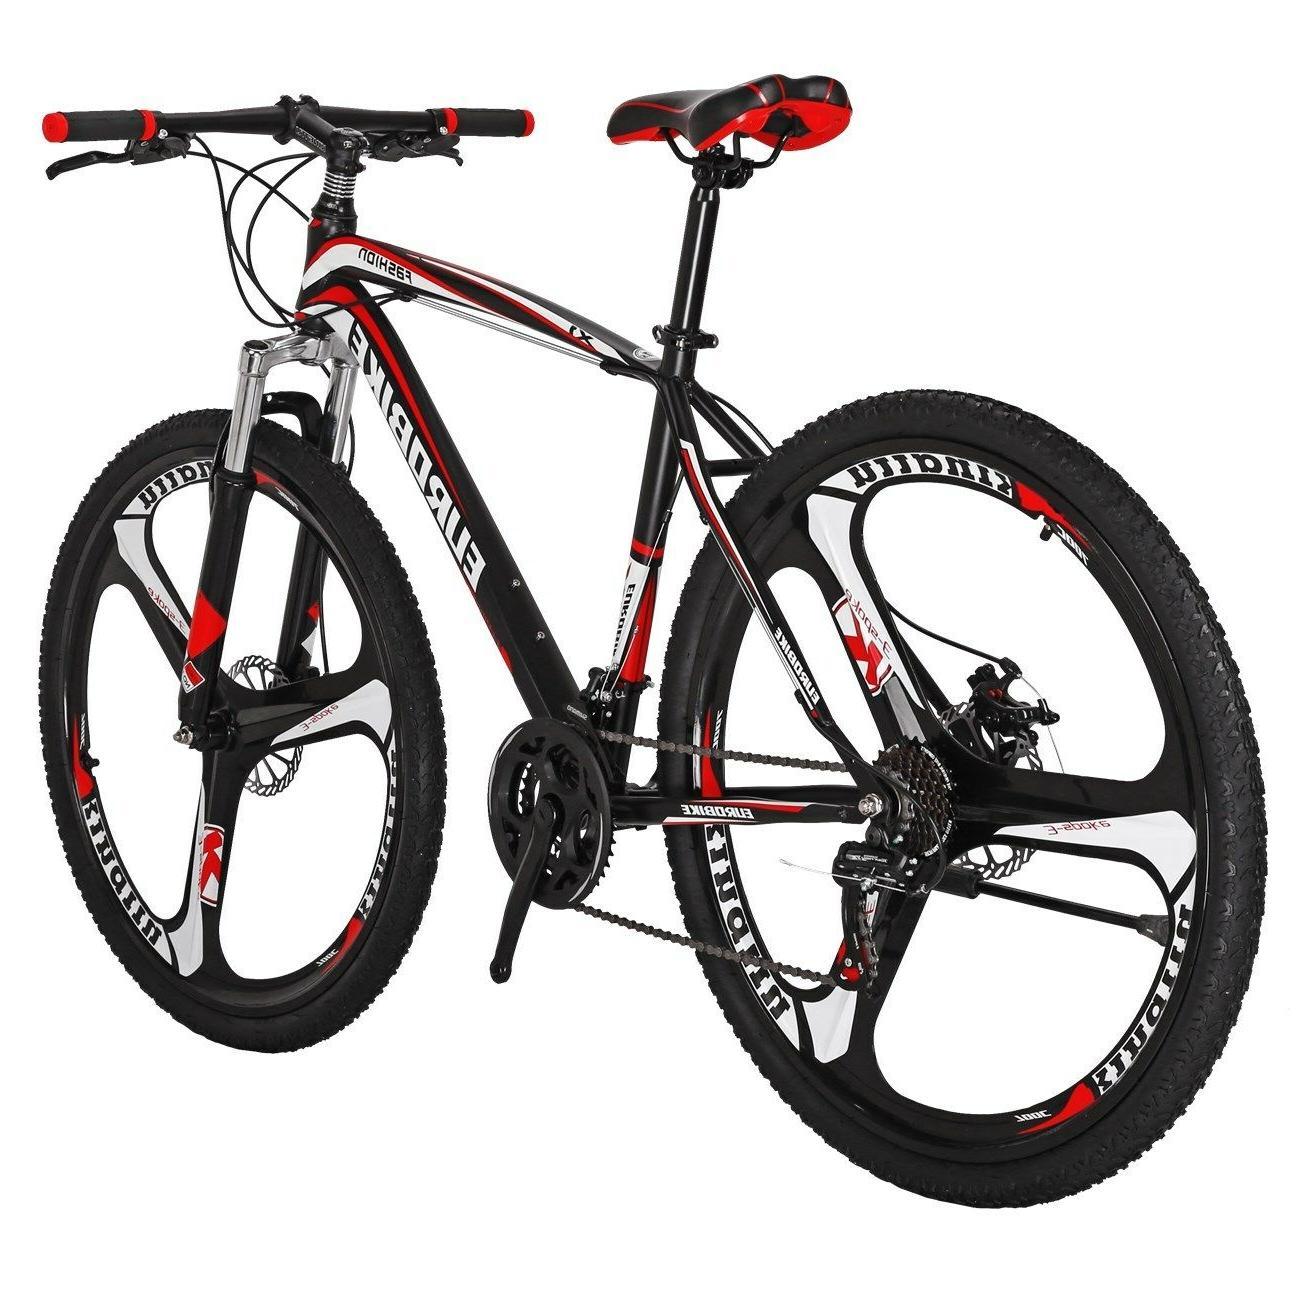 Speed Bikes Disc brakes bicycle 3 Spoke